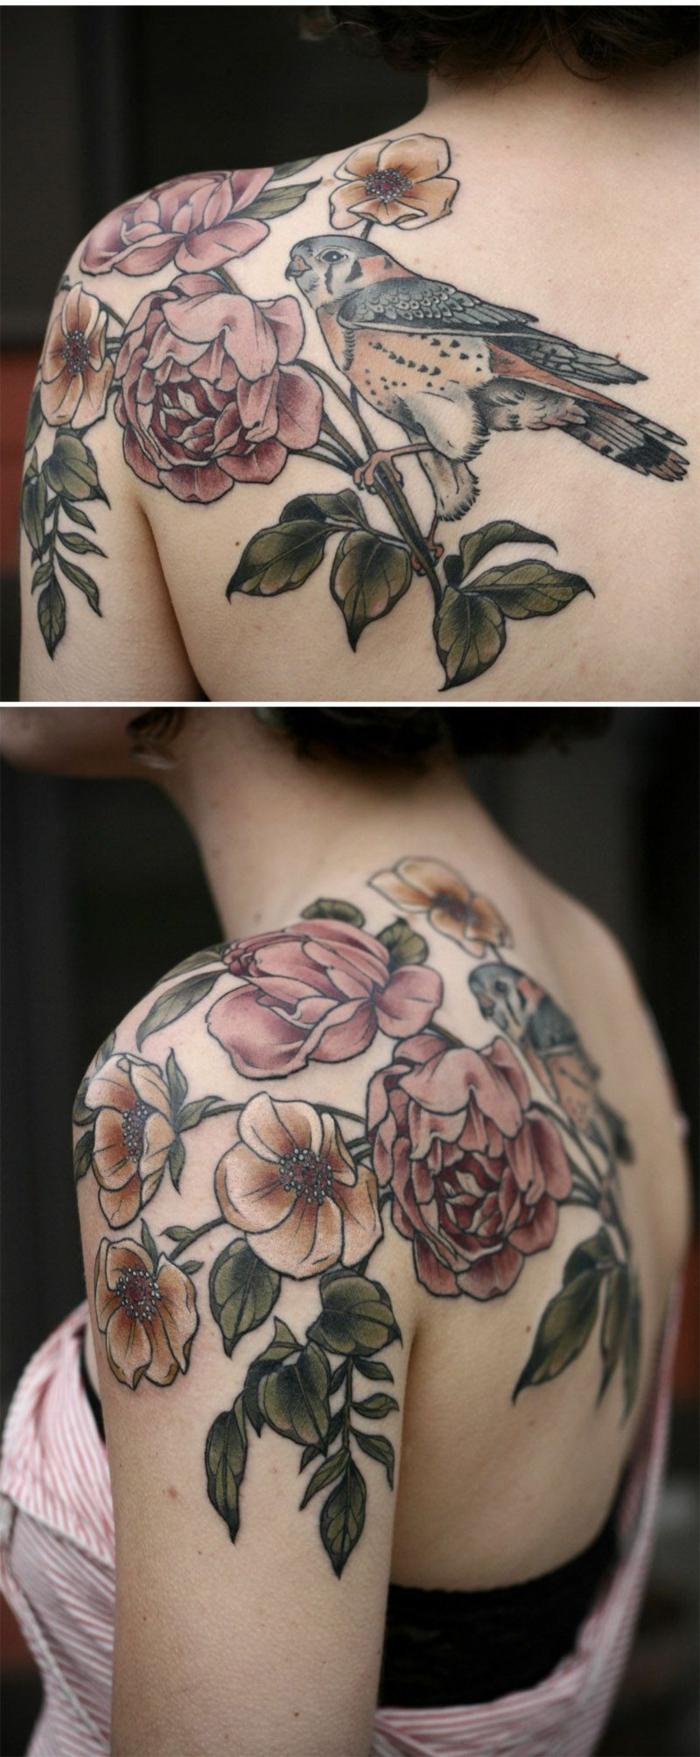 tatuajes tradicionales con motivos florales,grande tatuaje en la espalda, tattoo con peonias